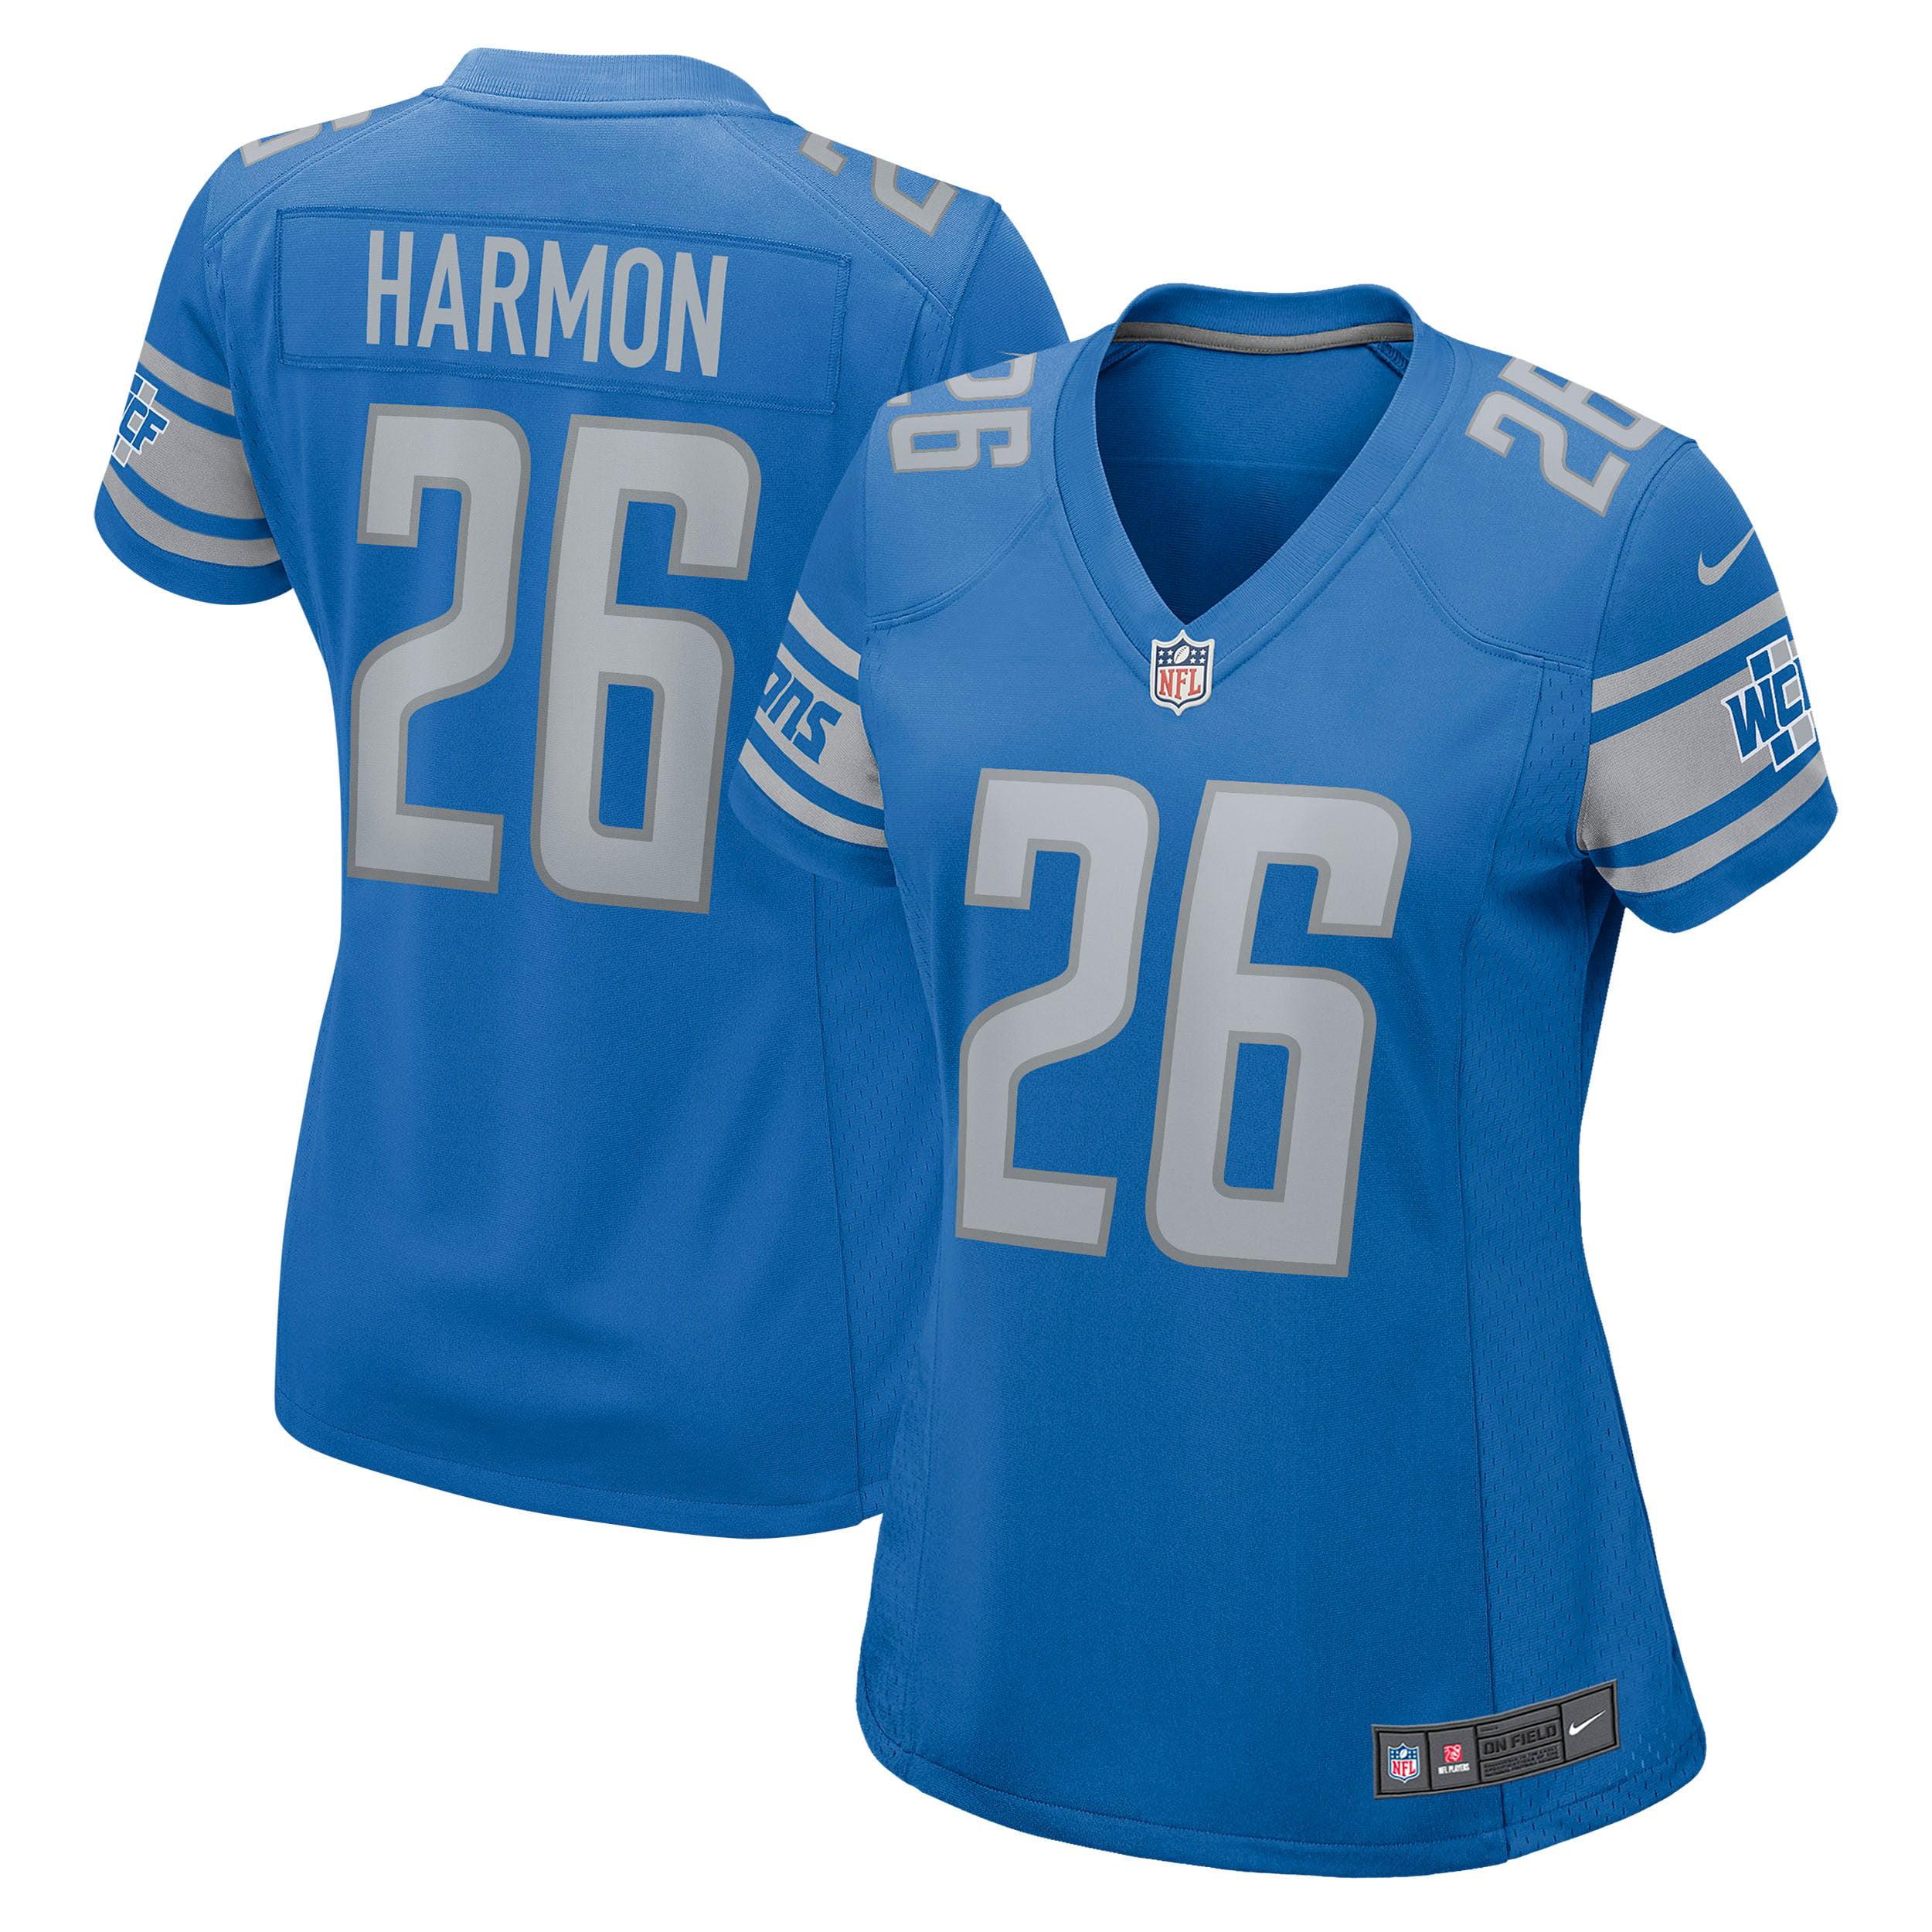 duron harmon jersey